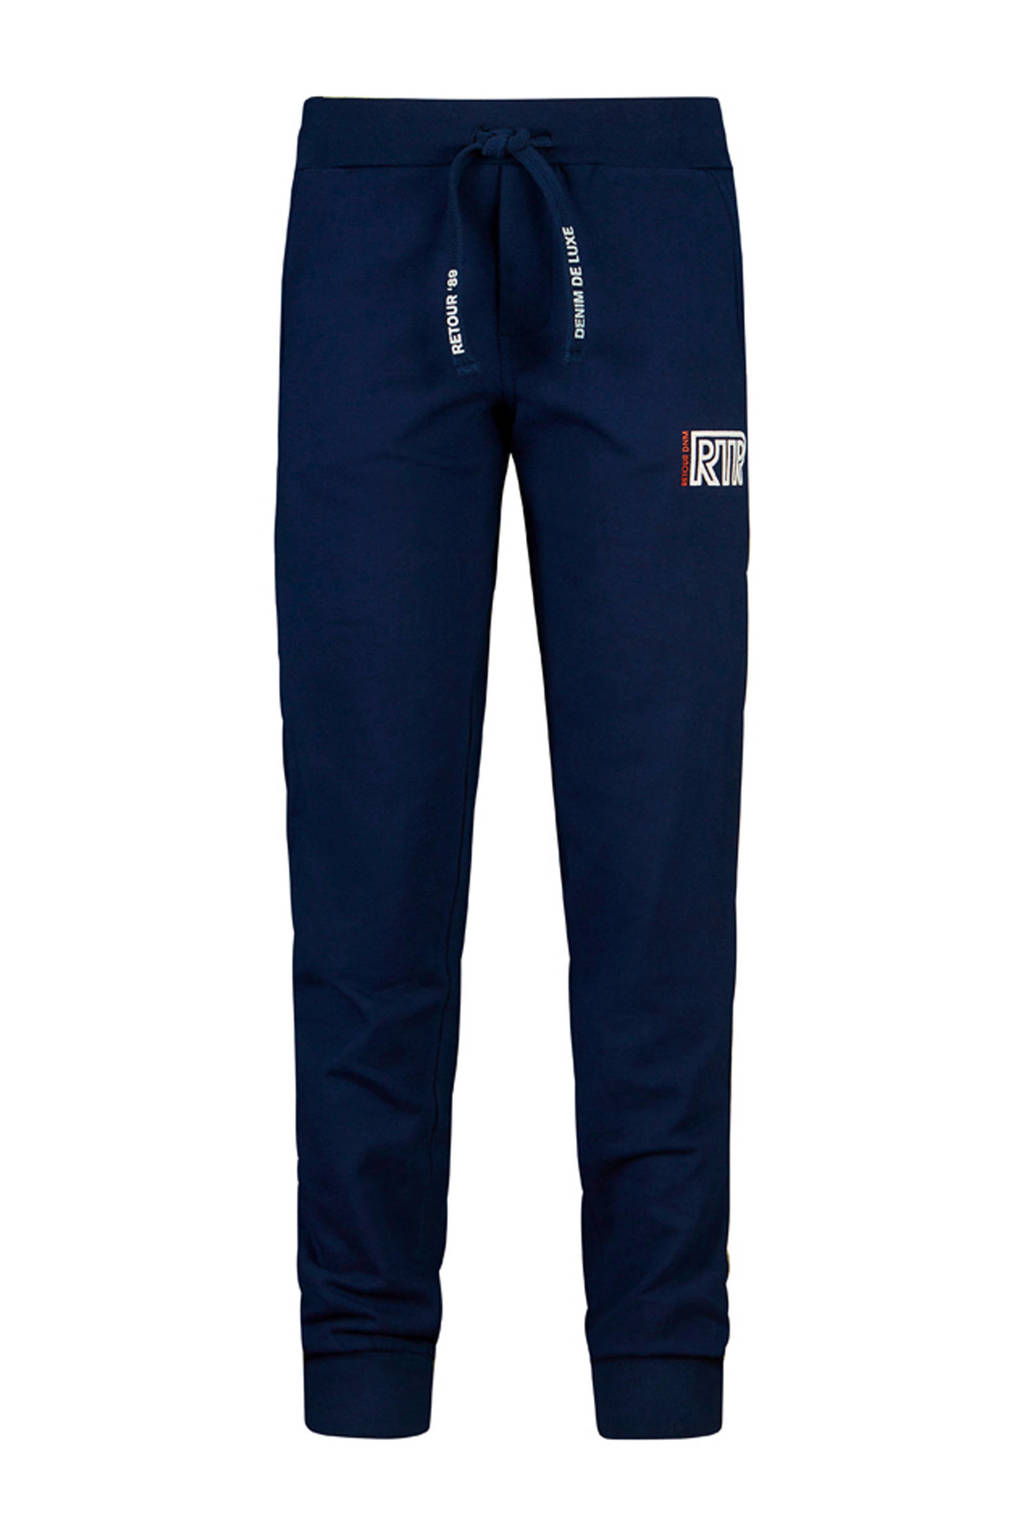 Retour Denim regular fit broek Nico met tekst donkerblauw/wit, Donkerblauw/wit